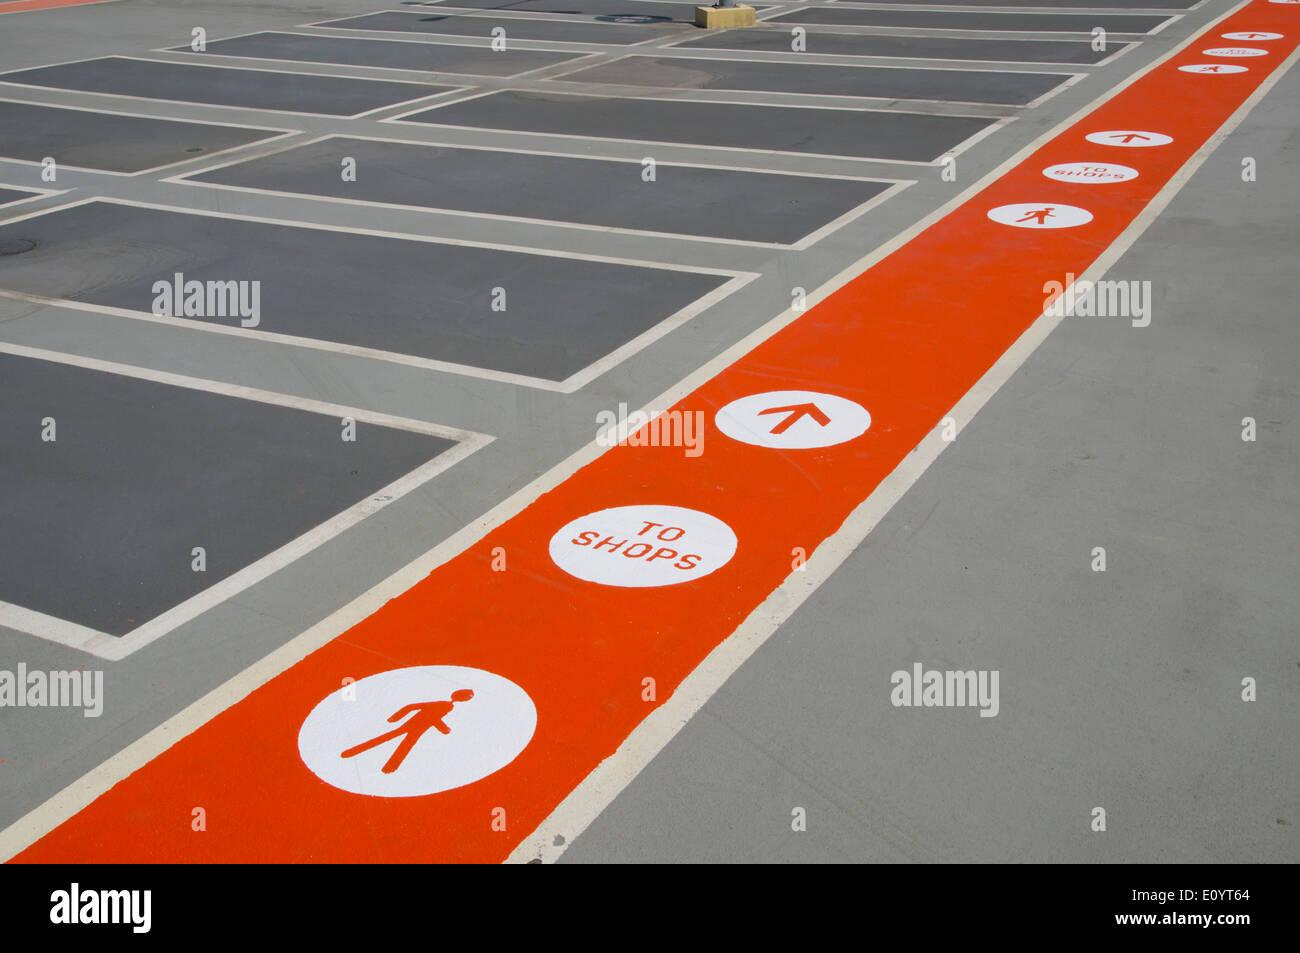 UK, England, London, Stratford multistorey parking - Stock Image